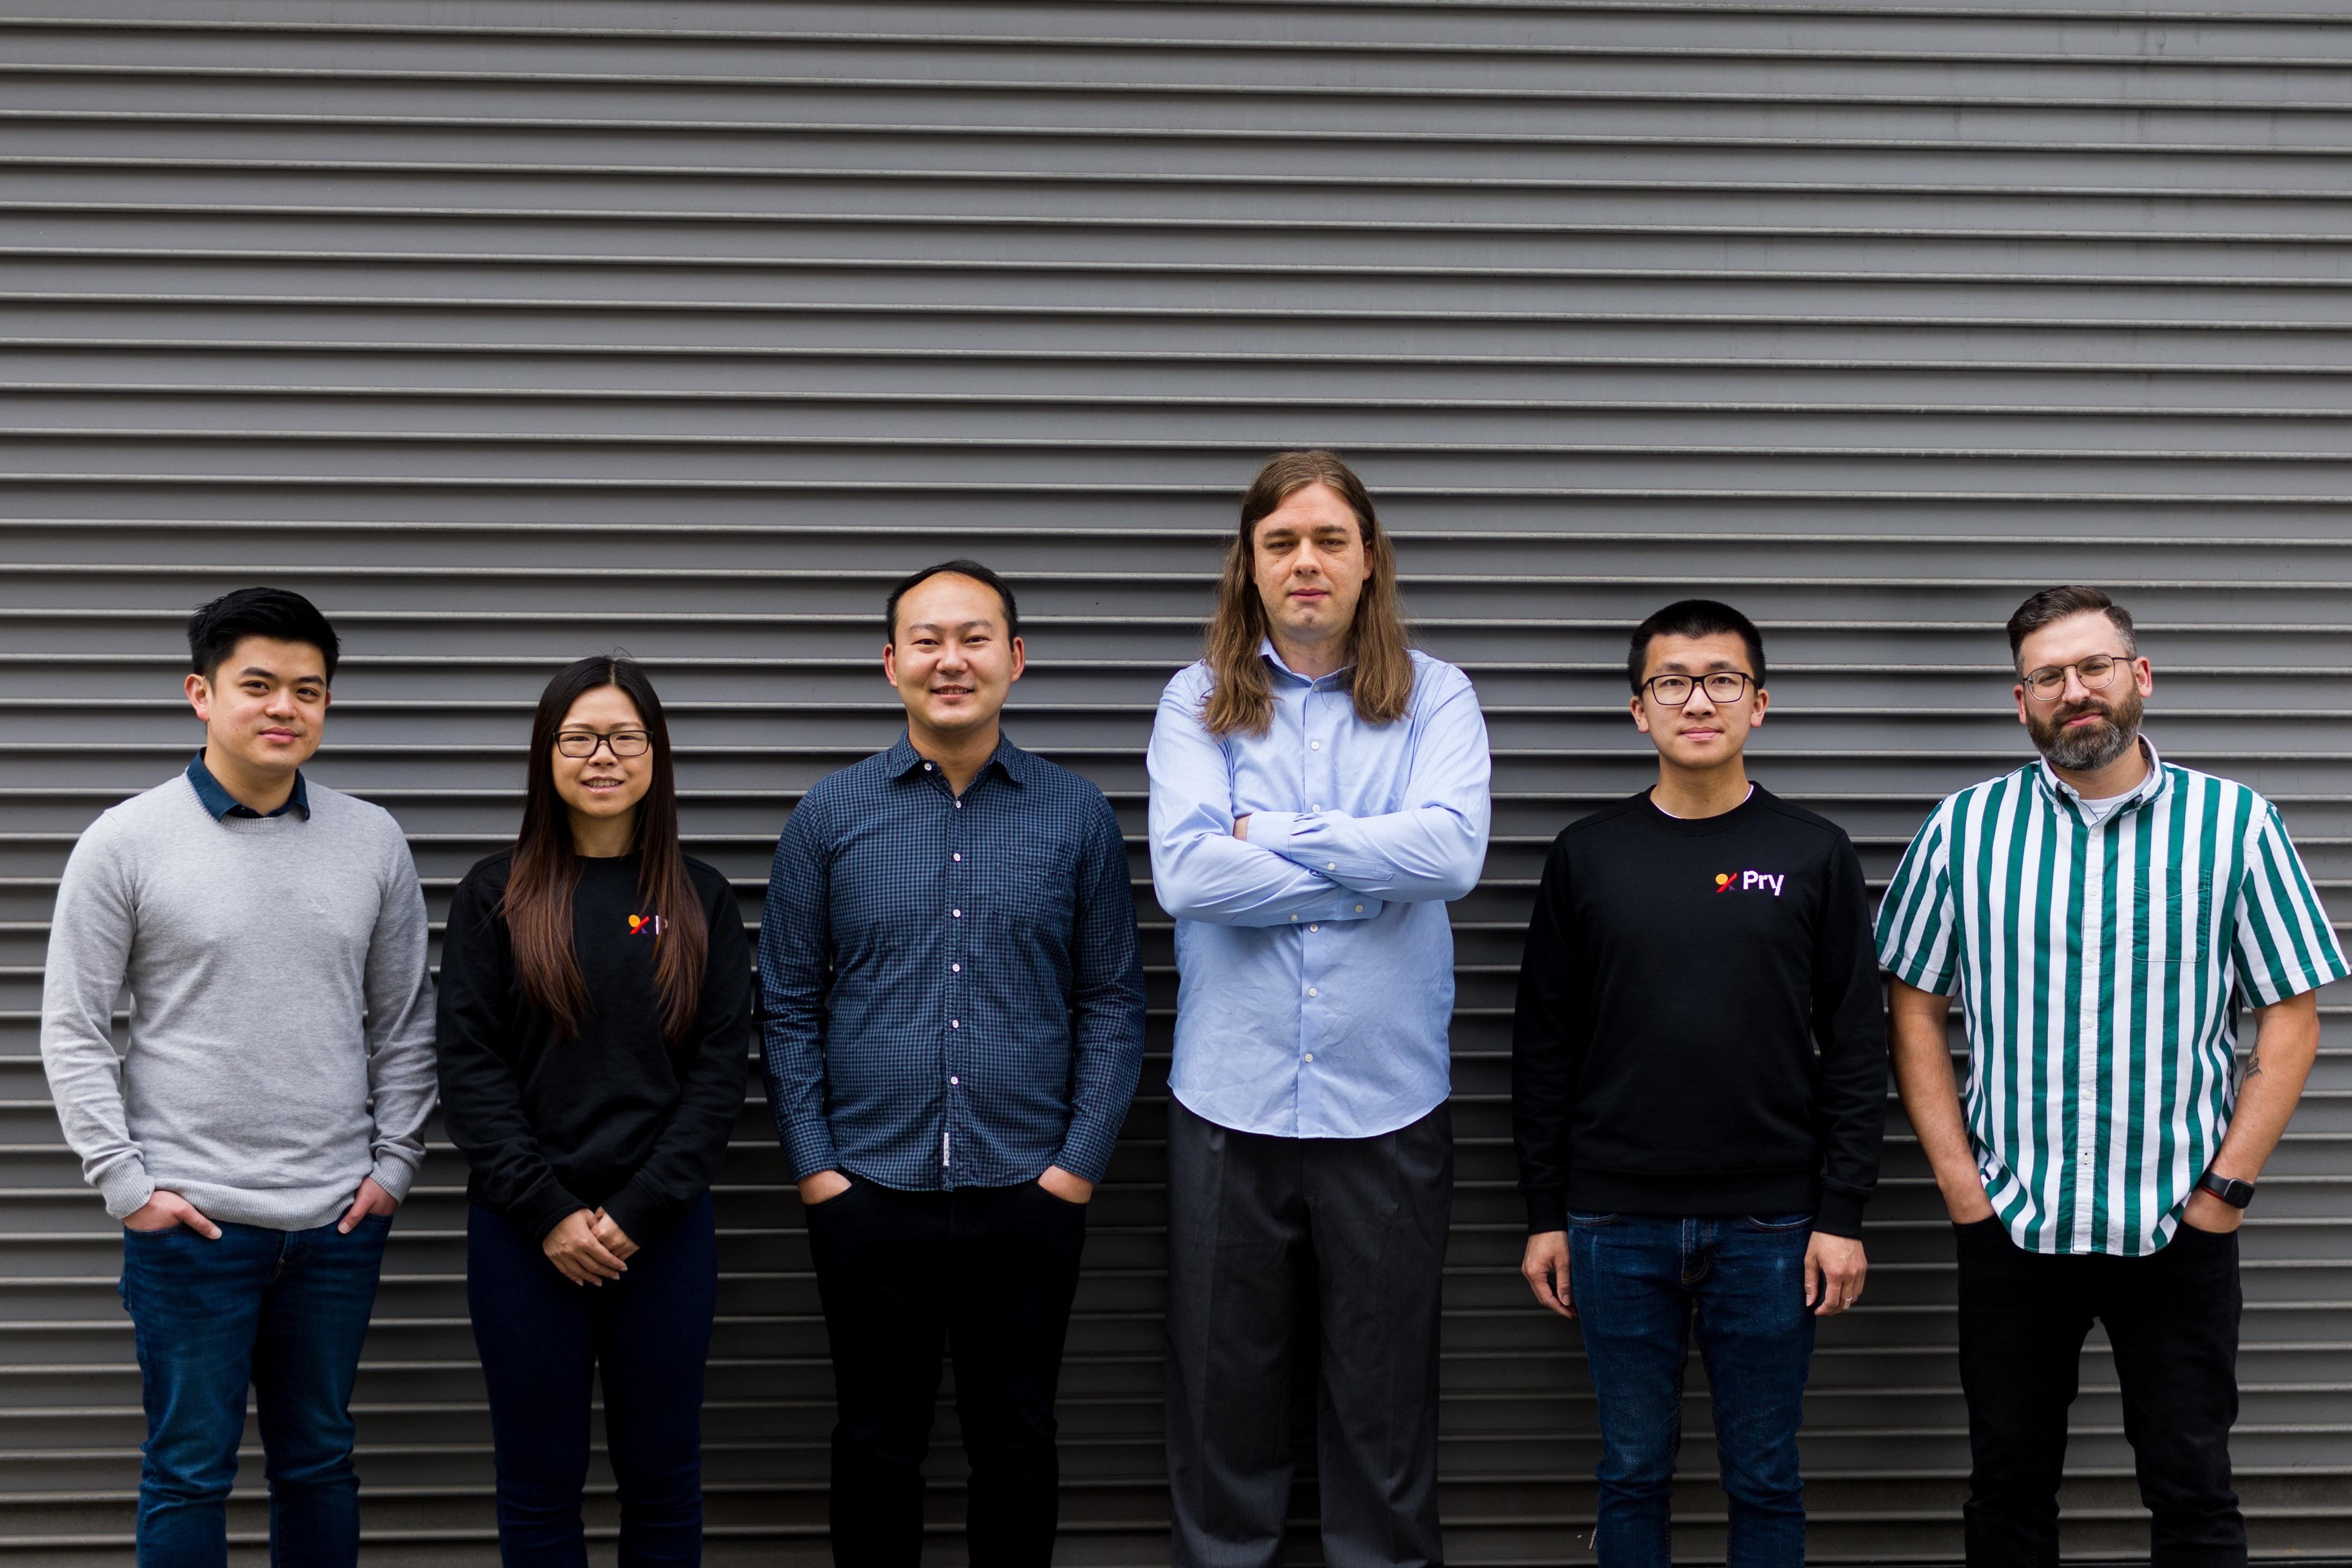 Pry's early team. Wilson Jian, Tiffany Wong, Andy Su, Hayden Jensen, Hansen Yee, Alex Sailer.